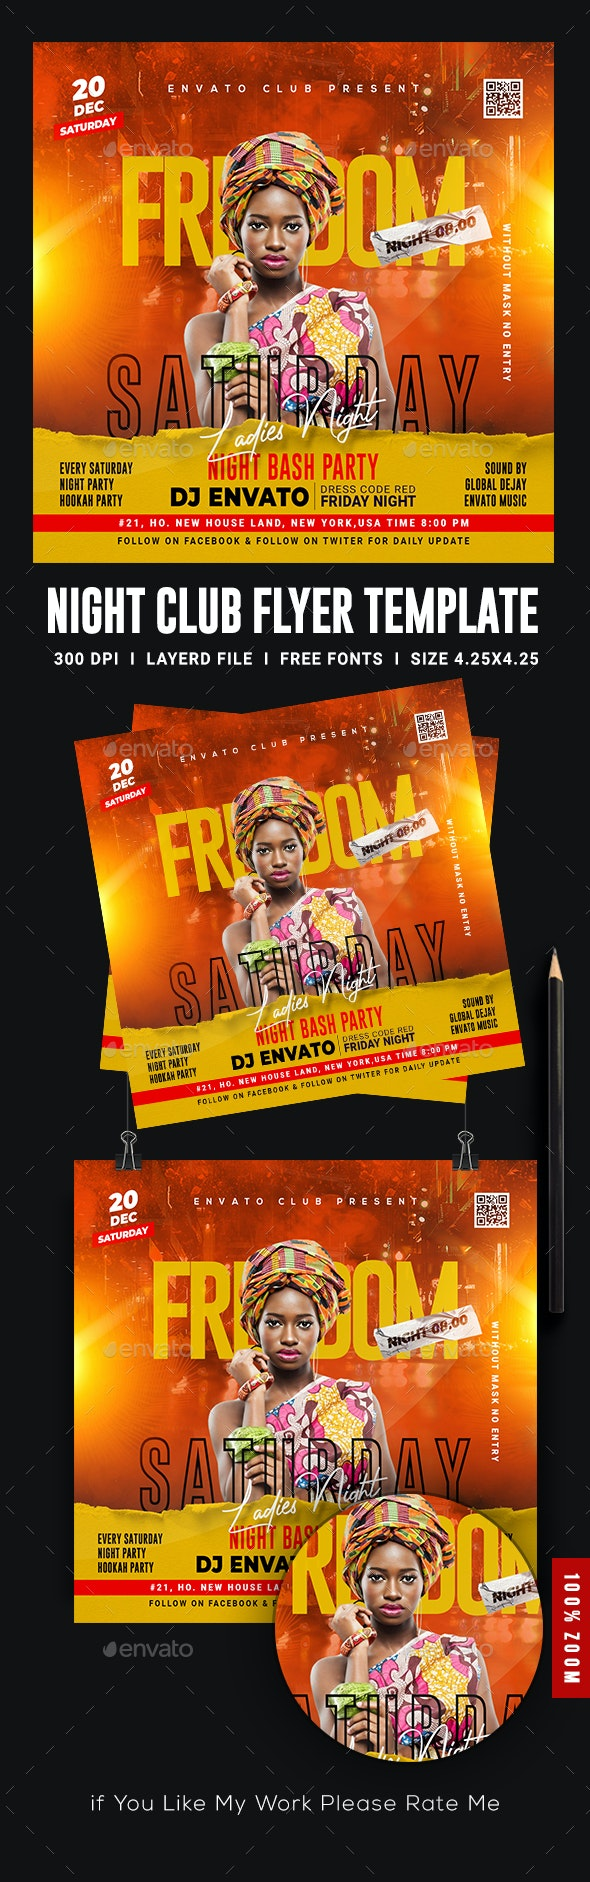 Ladies Night Club Flyer Template - Flyers Print Templates